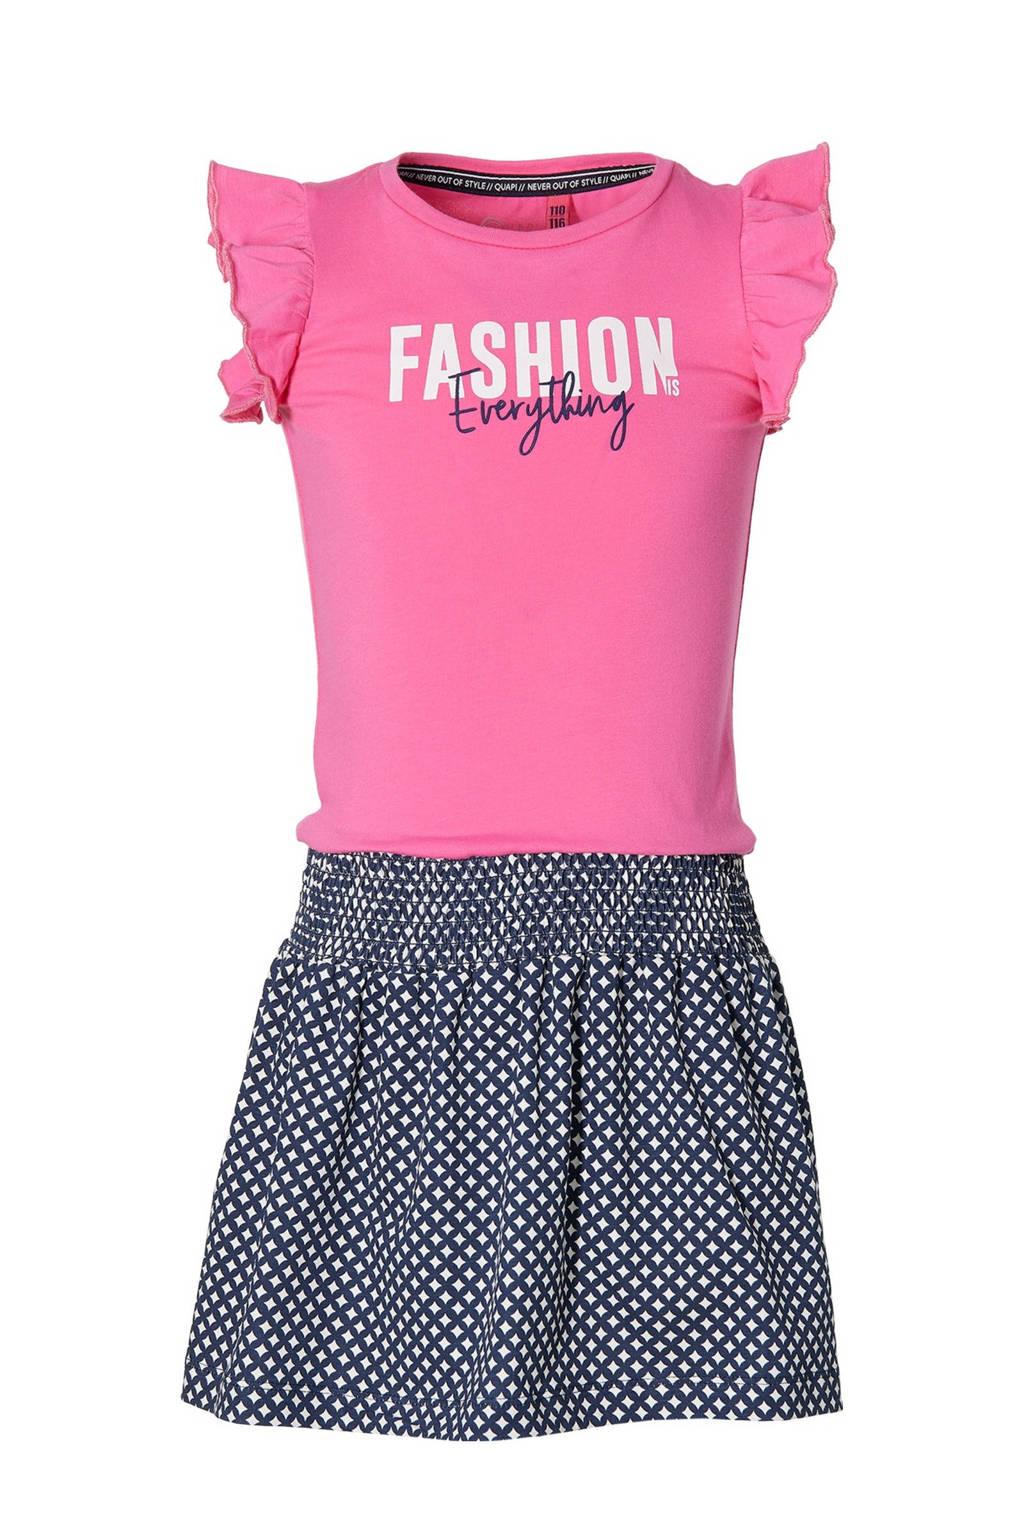 Quapi Girls jurk Faily met all over print en ruches donkerblauw/fuchsia, Donkerblauw/fuchsia